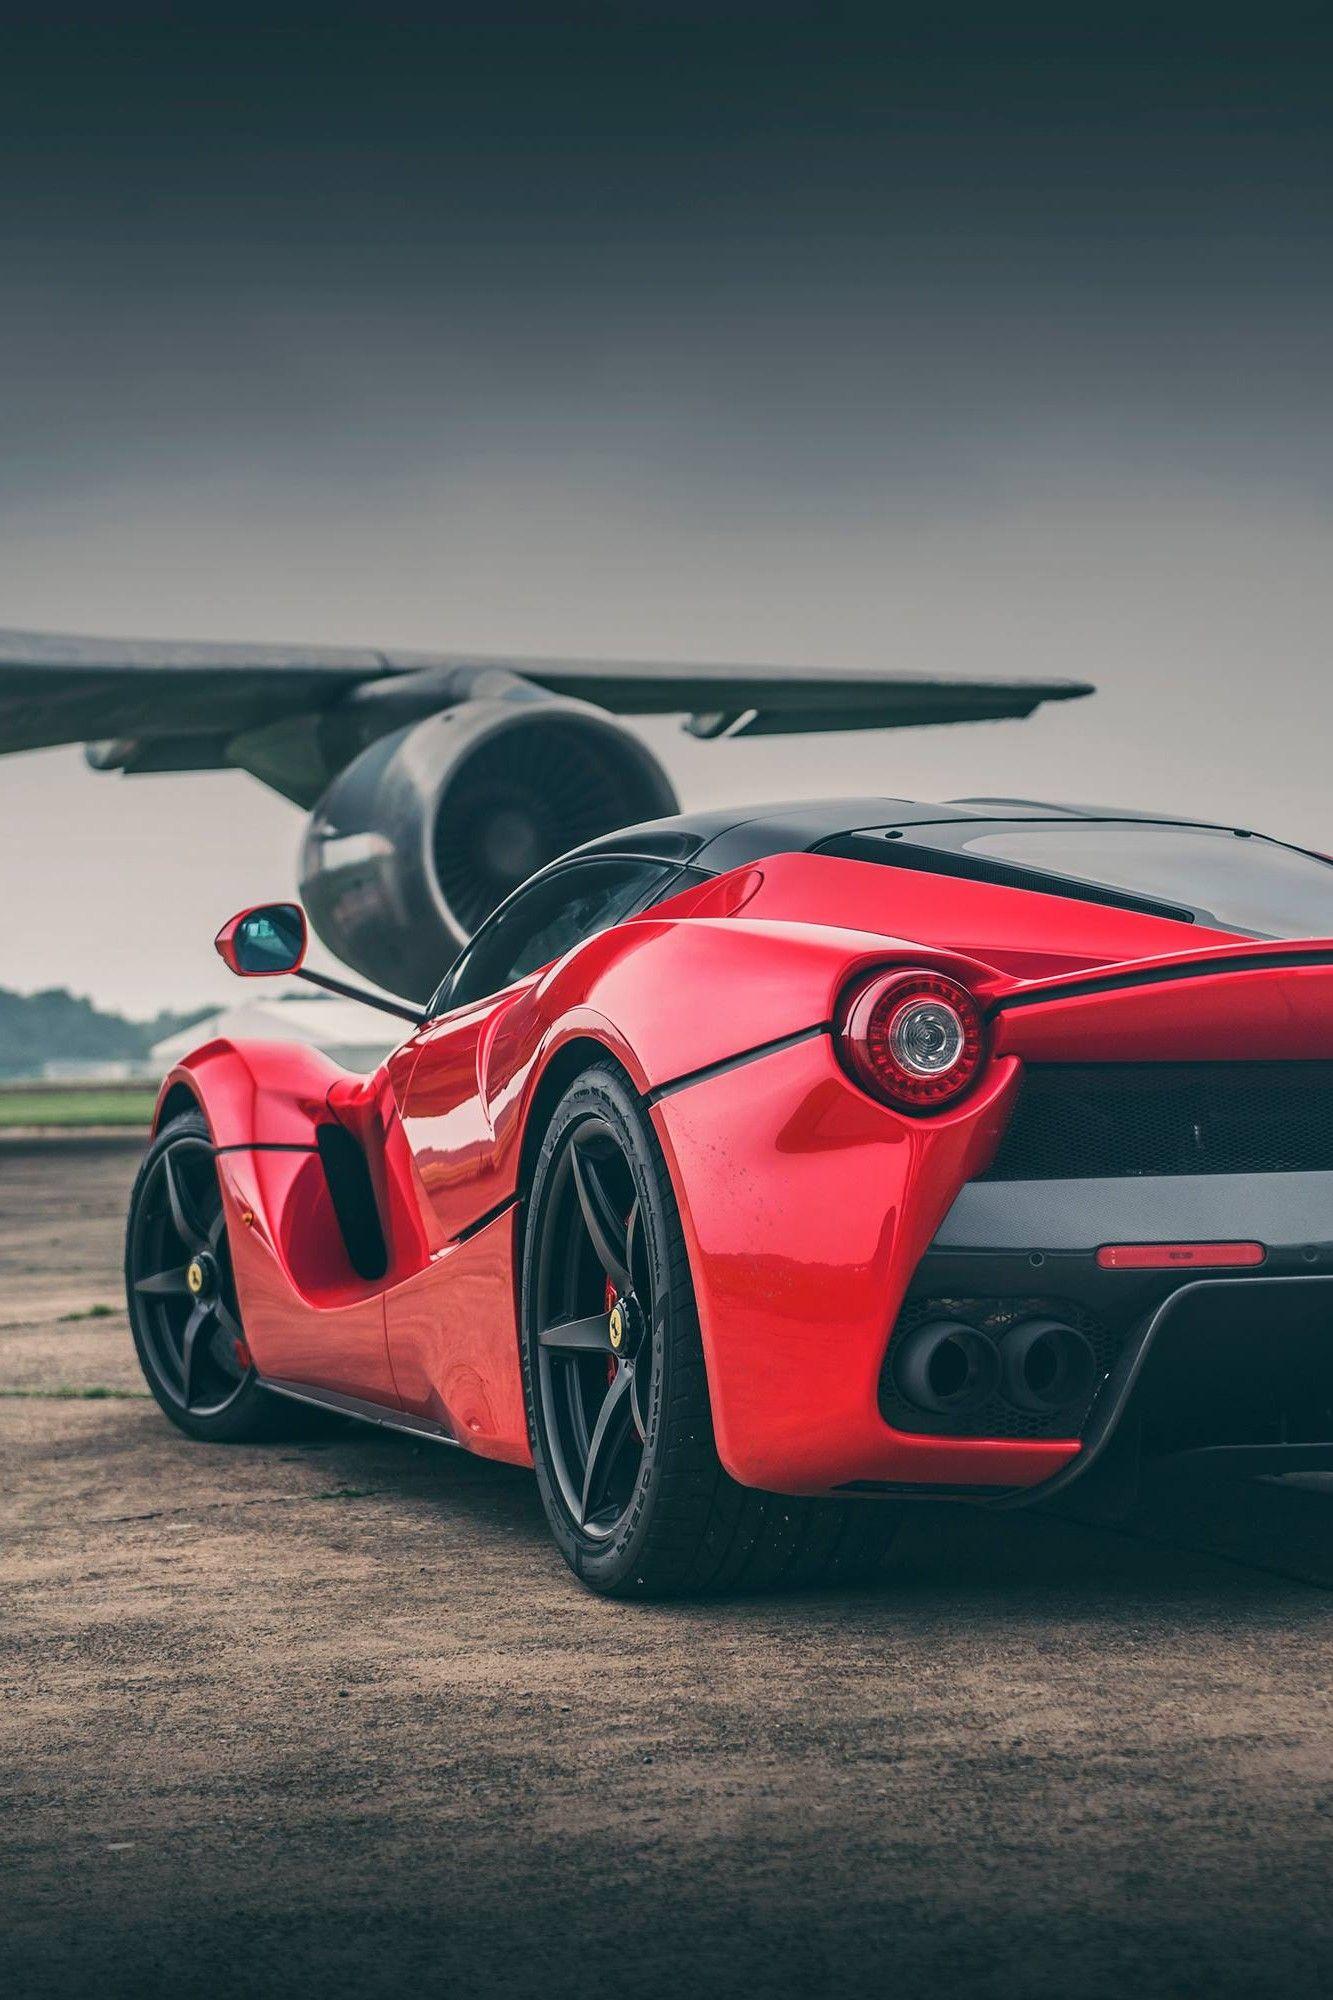 Random Inspiration 176 Architecture Cars Style Gear Super Cars Ferrari Laferrari Ferrari Car